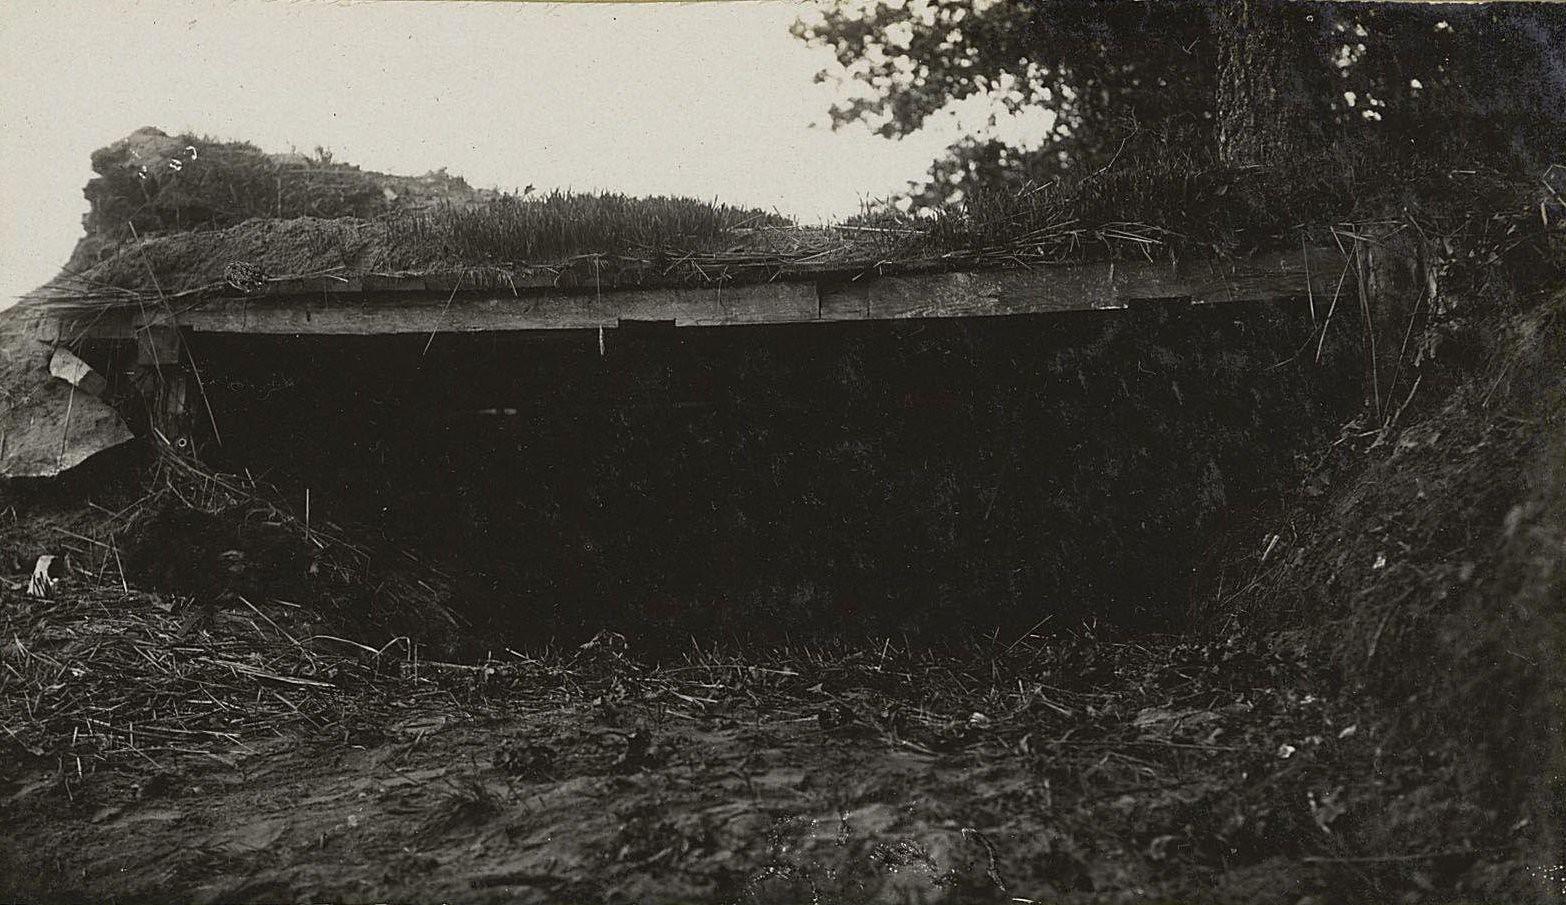 24. Австрийский окоп возле леса